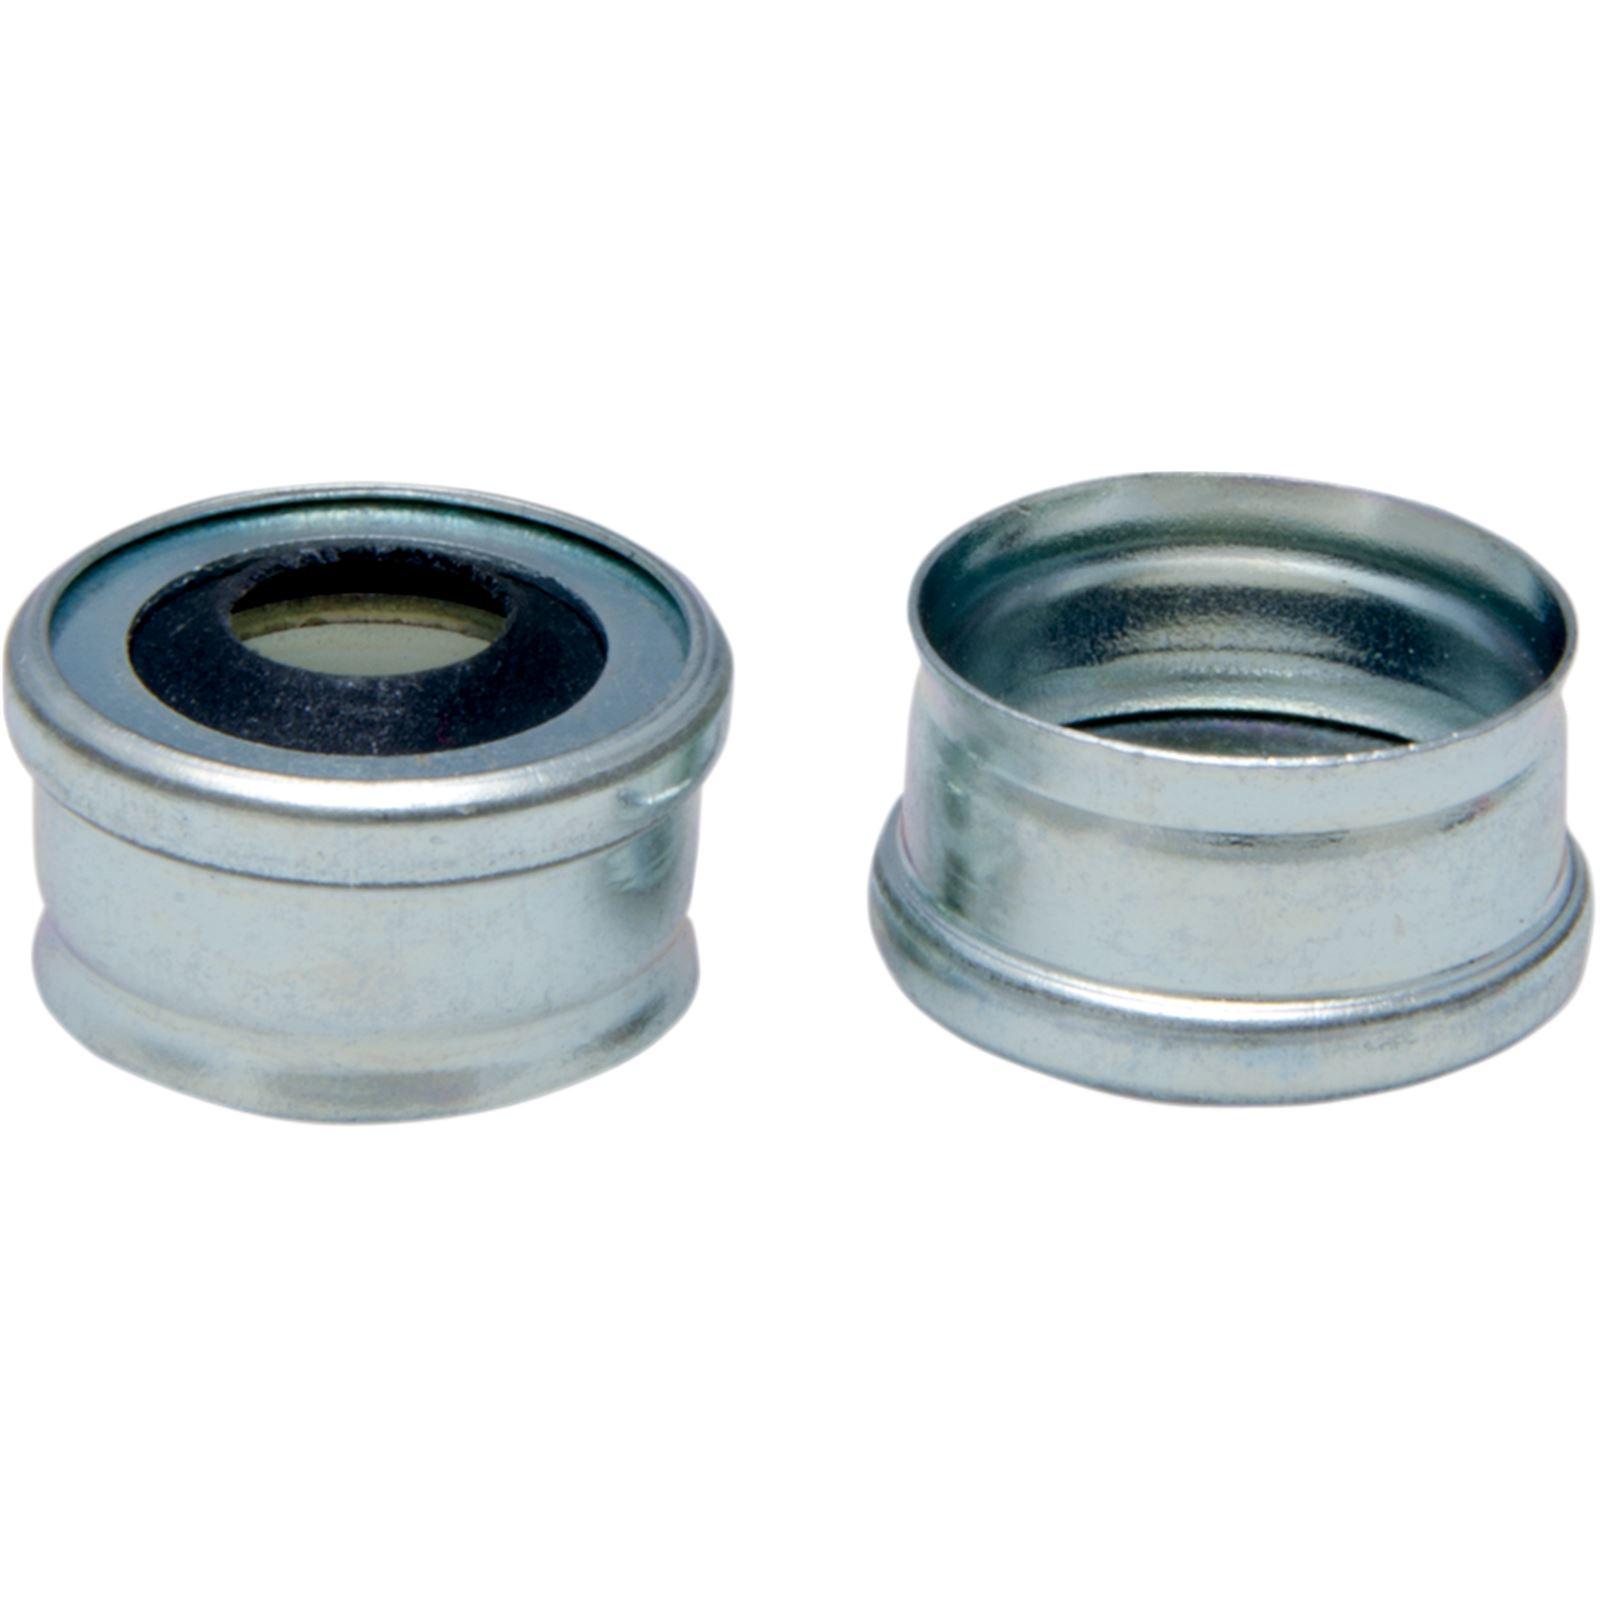 KPMI OEM Replacement Seals